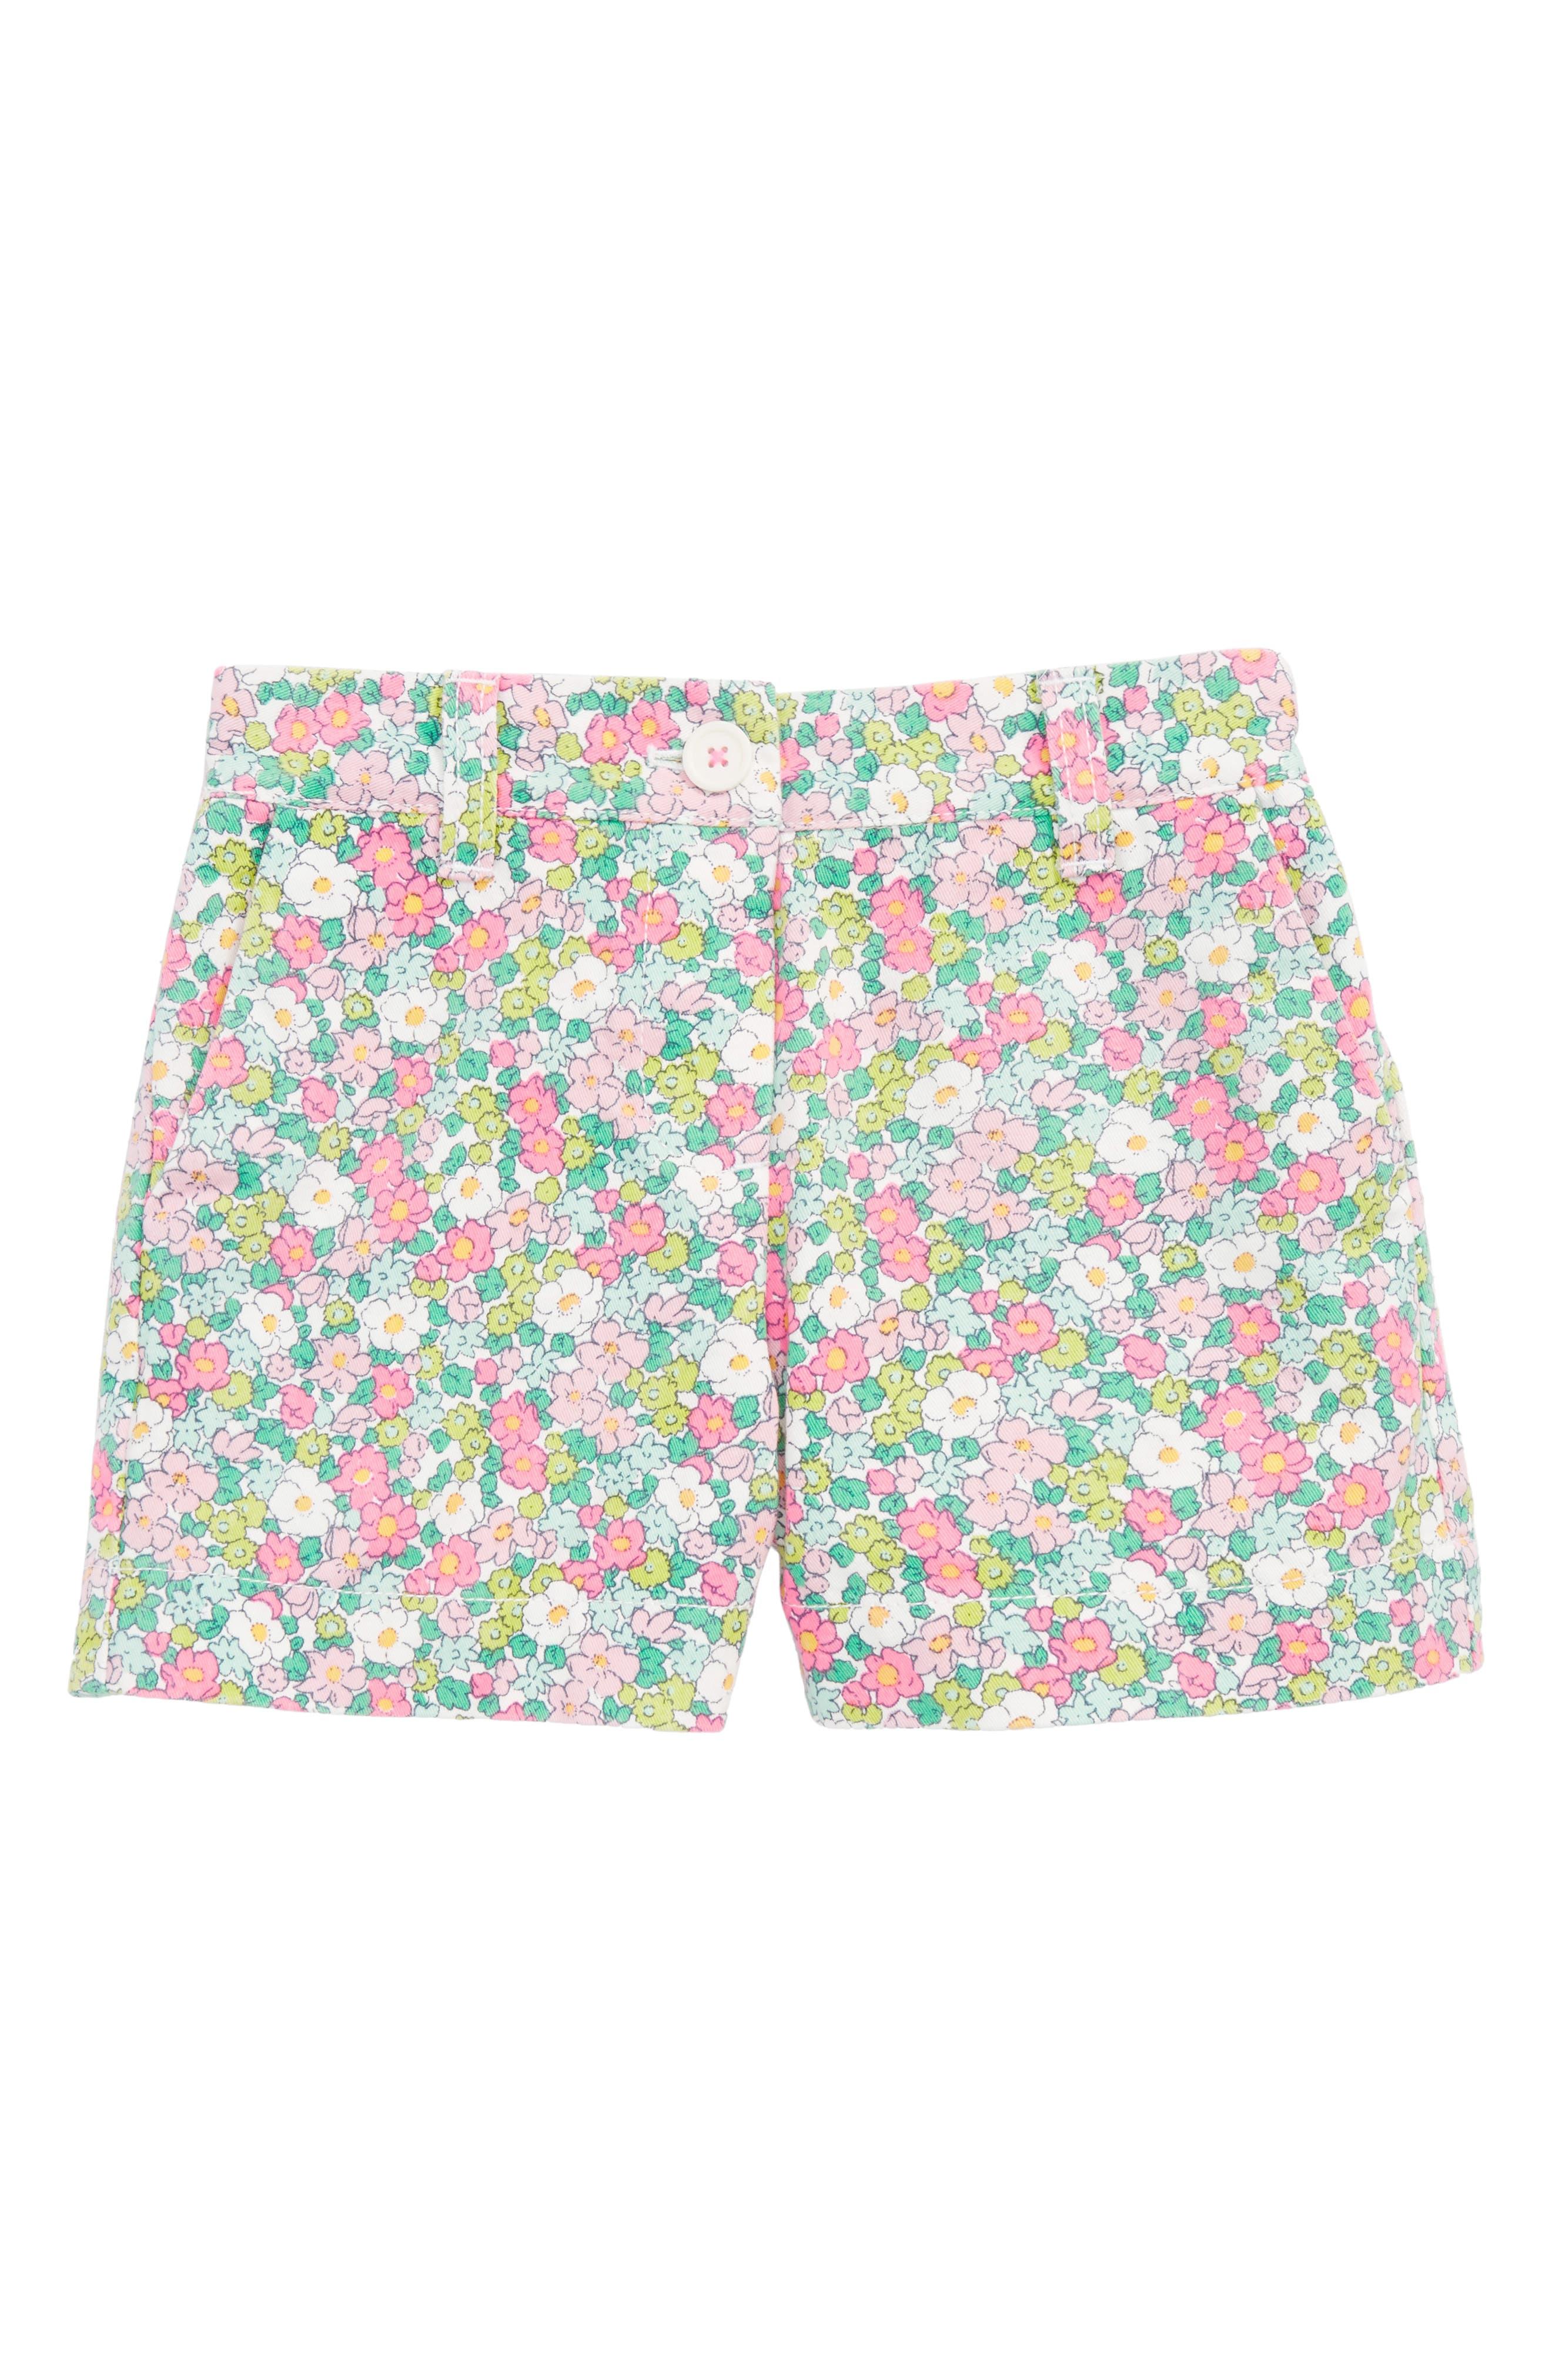 Bright Adventure Shorts,                             Main thumbnail 1, color,                             Knockout Pink Vintage Floral